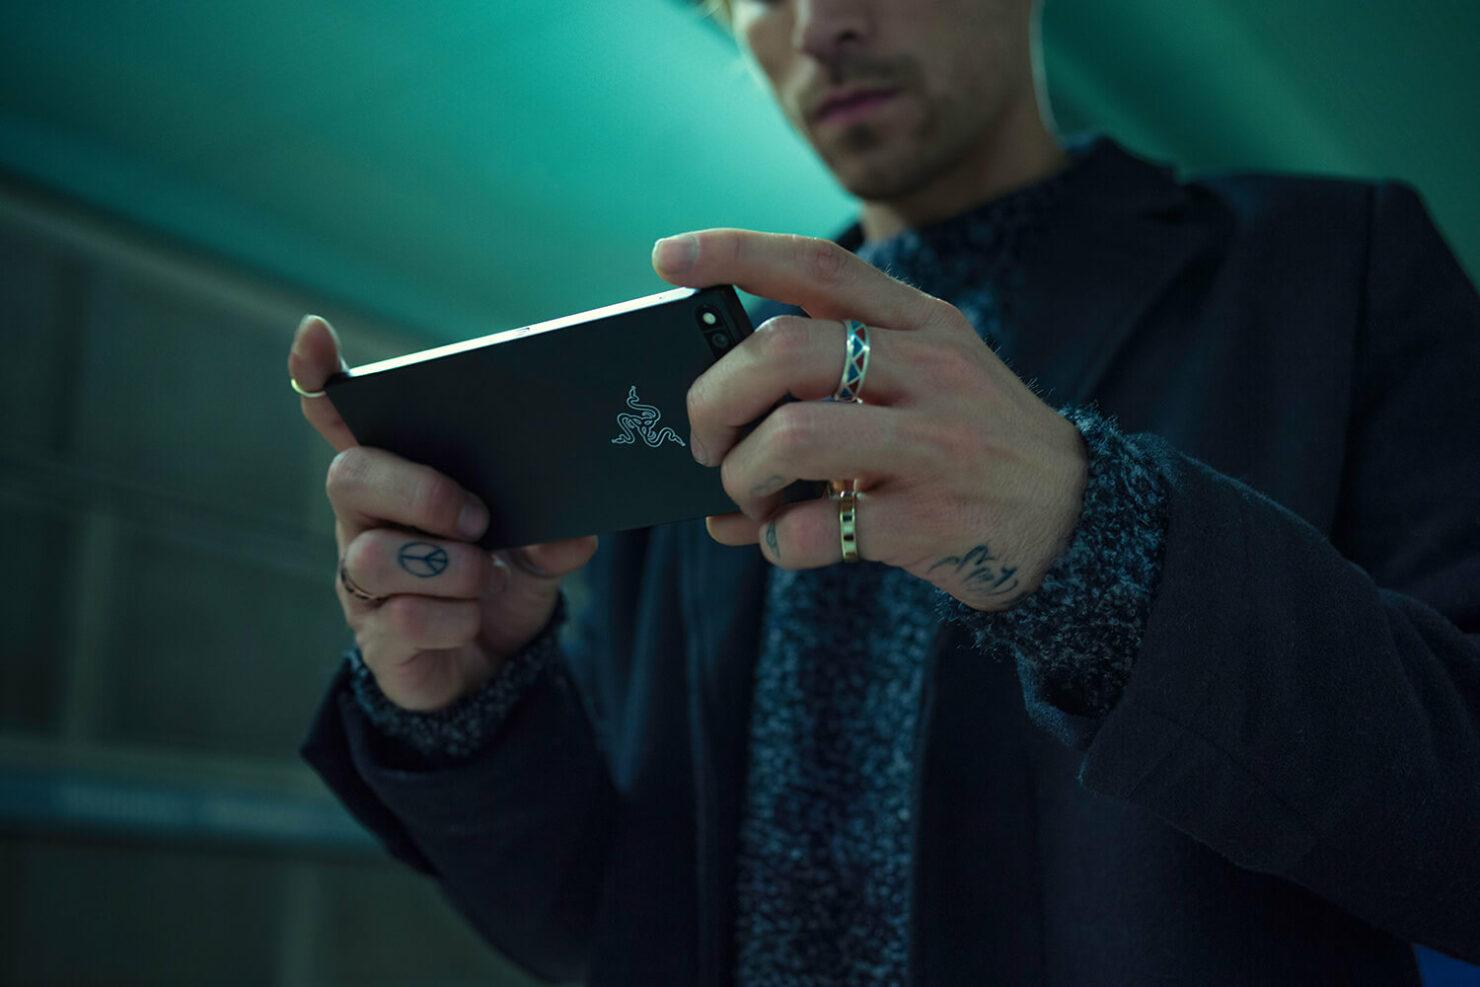 Razer Phone $300 discount